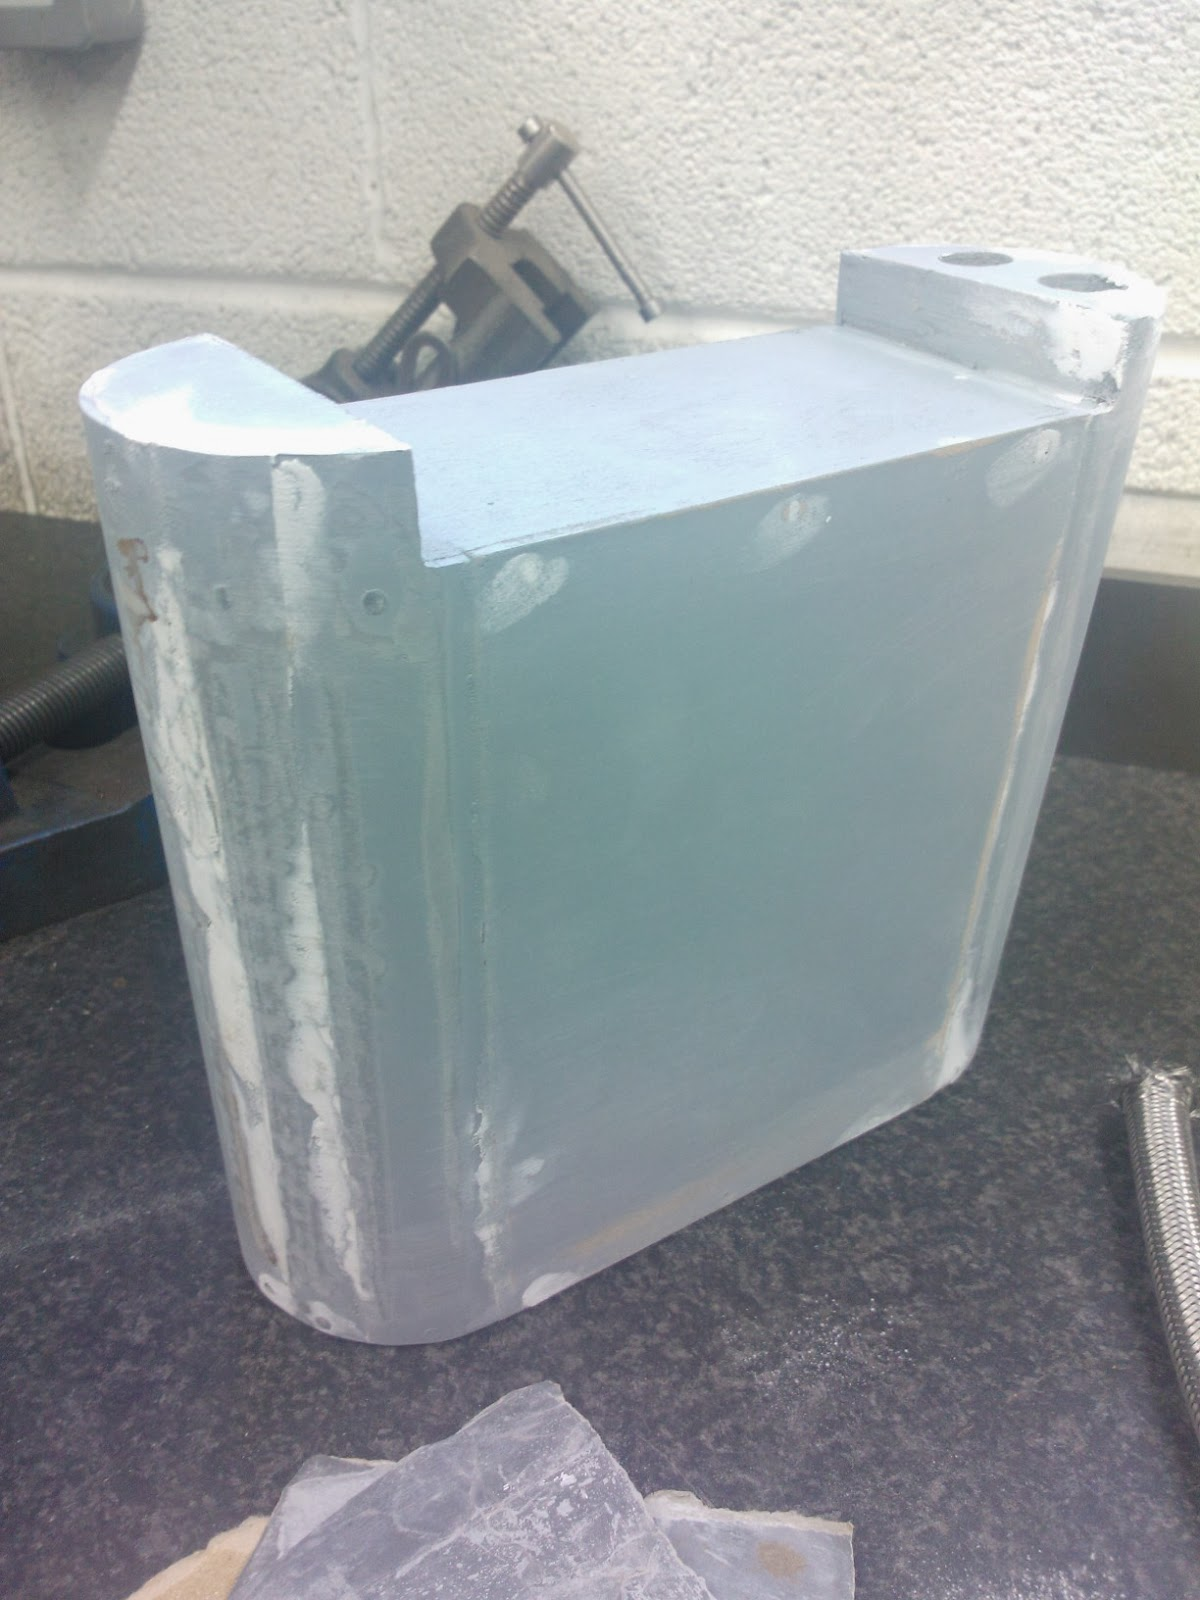 R5D4 Battery Box.